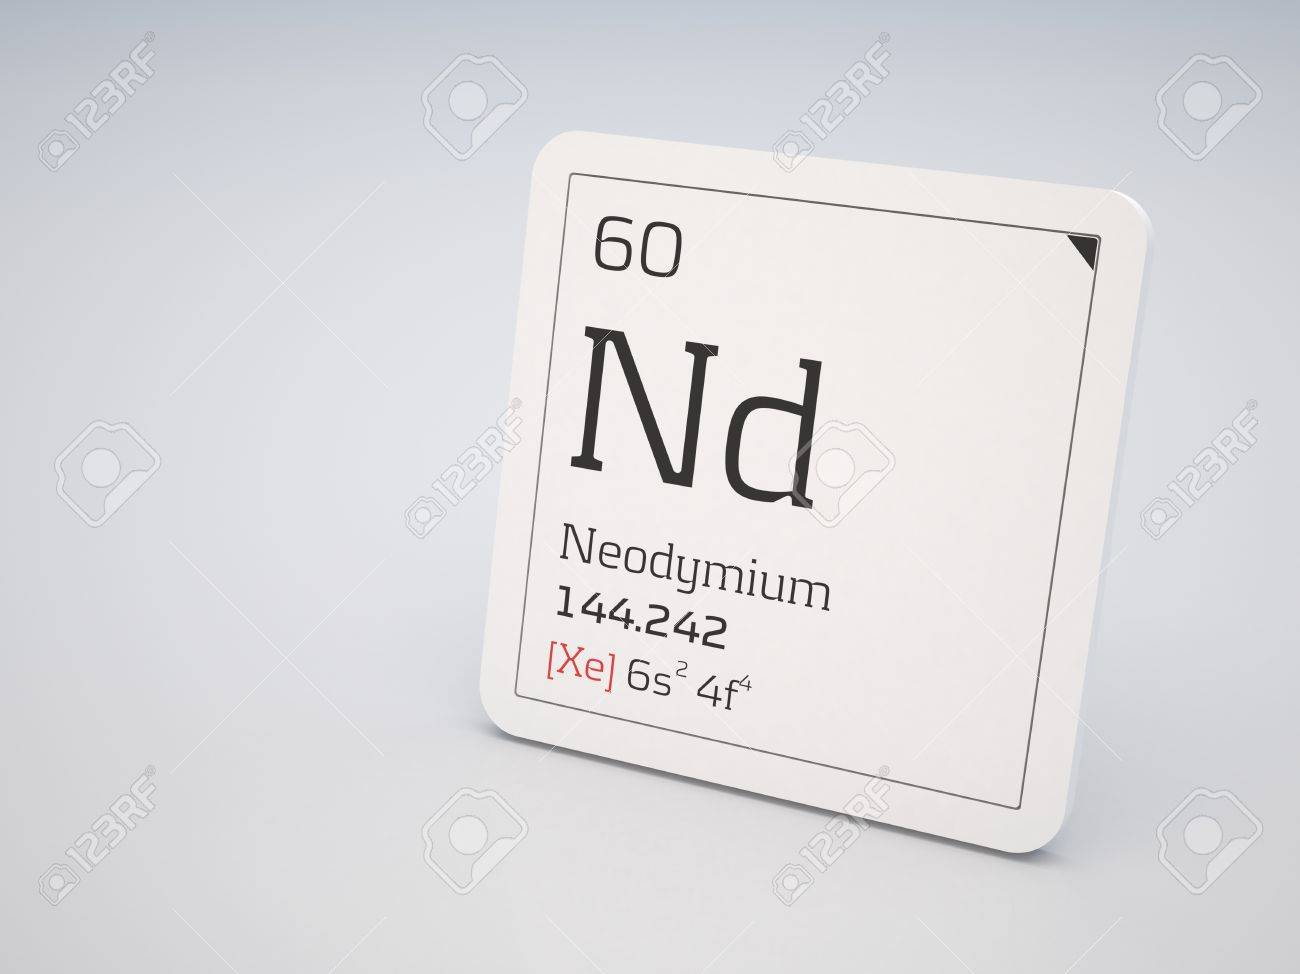 Neodymium element of the periodic table stock photo picture and neodymium element of the periodic table stock photo 11959110 gamestrikefo Choice Image